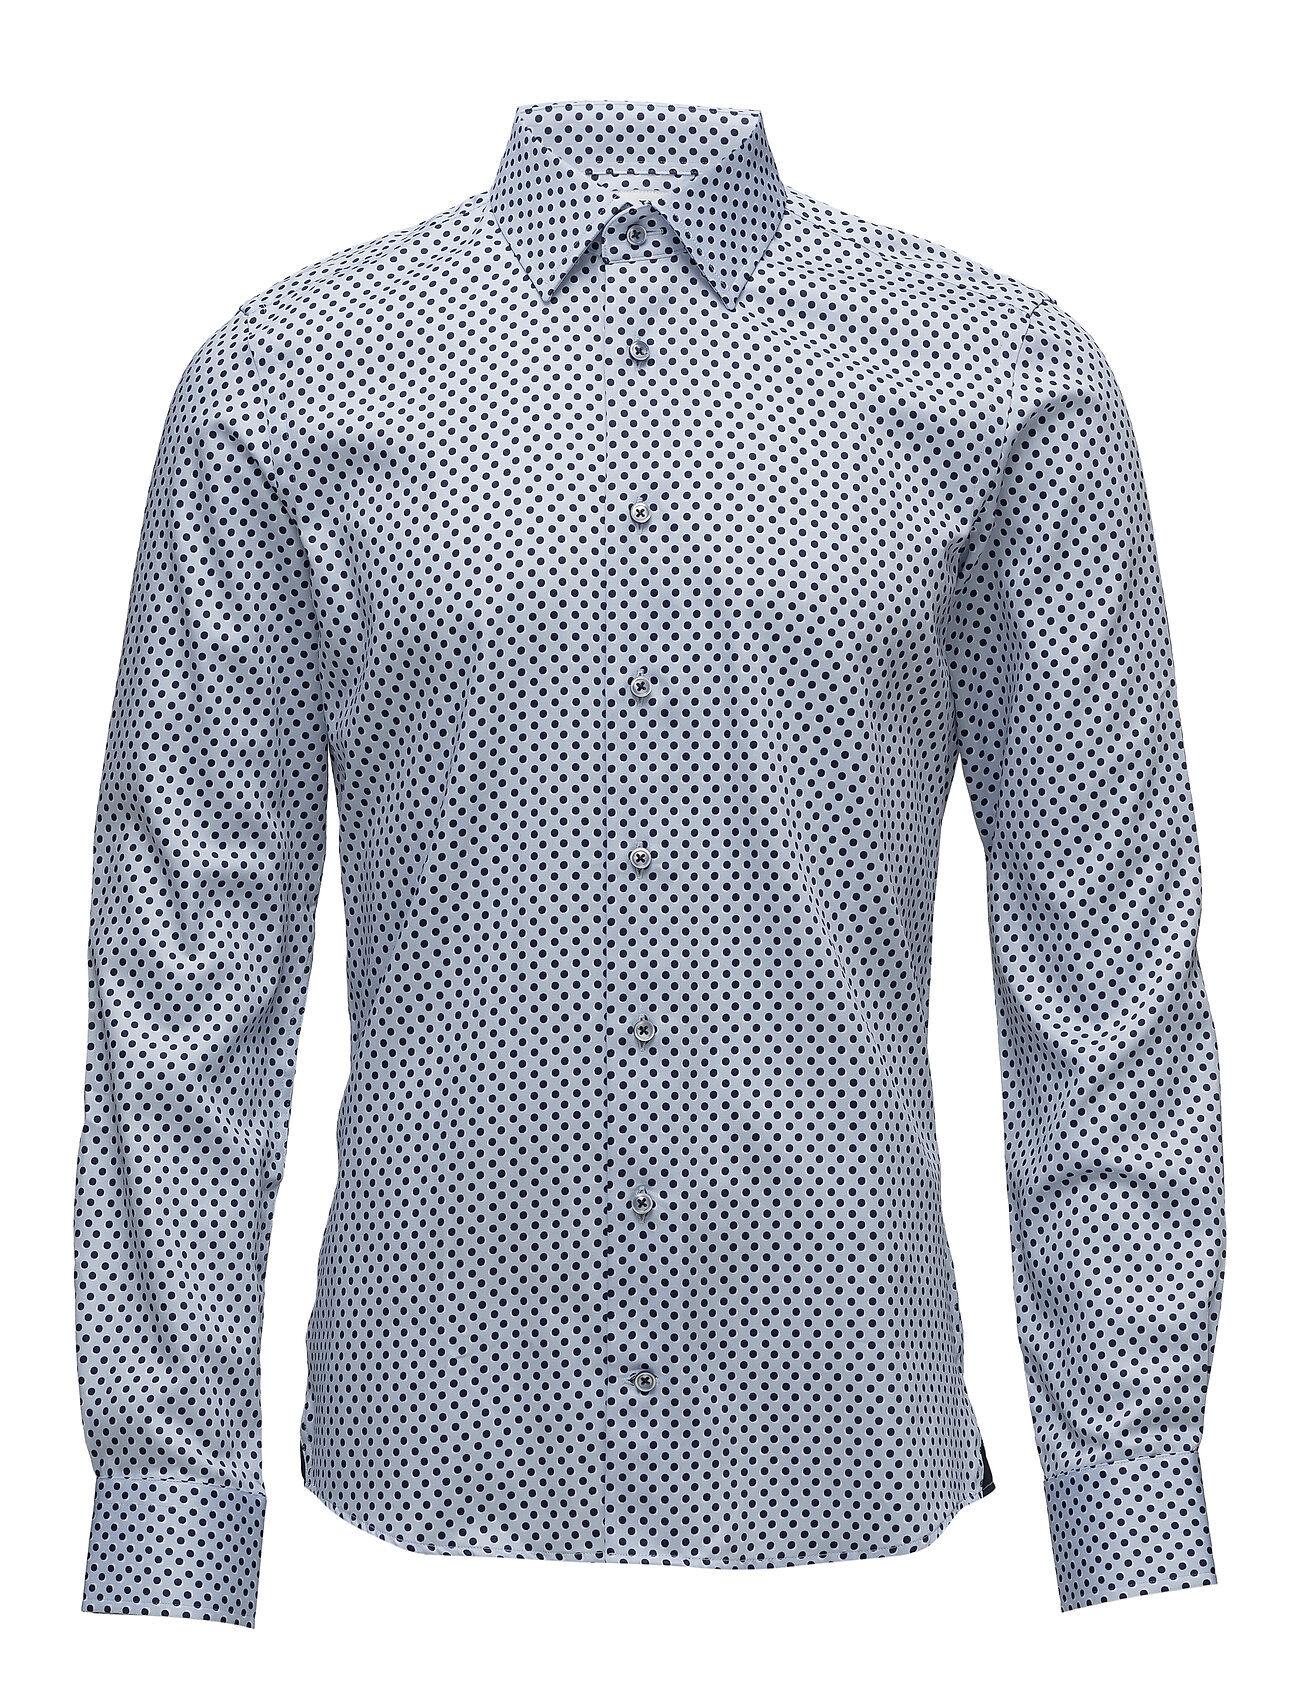 XO Shirtmaker by Sand Copenhagen 8039 - Jake Sc